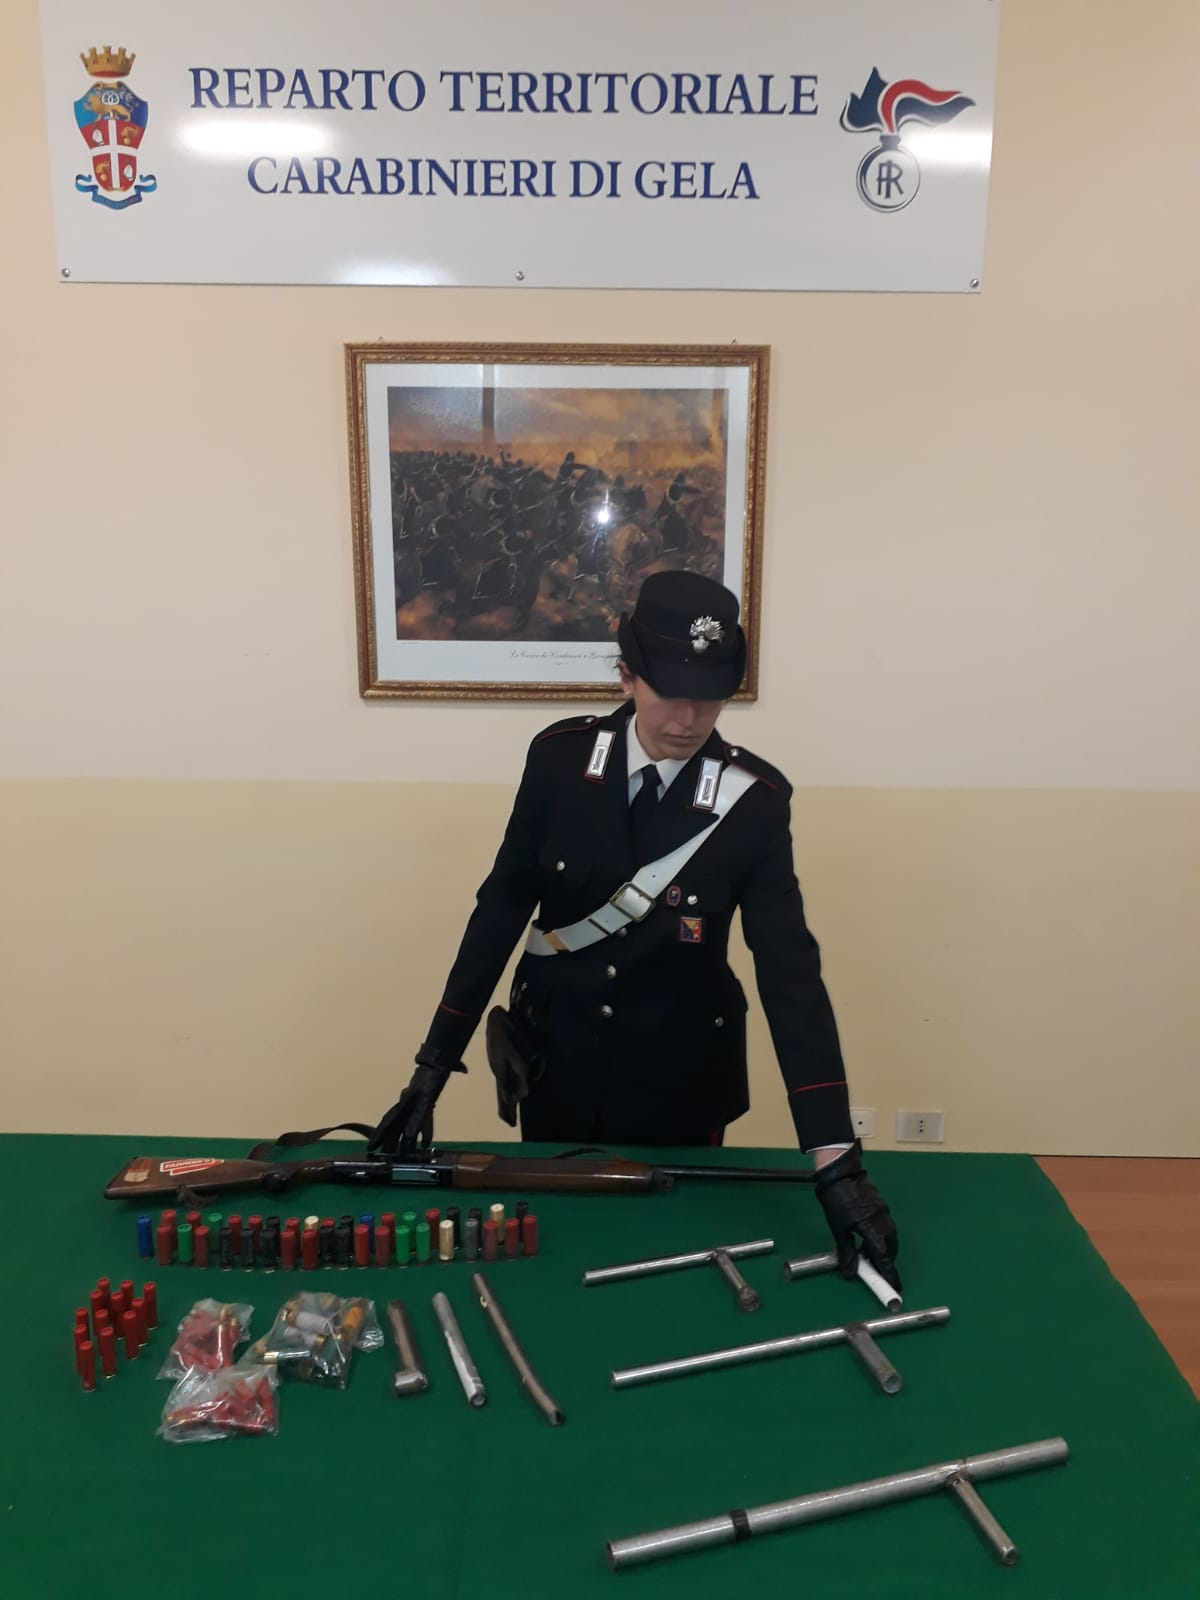 Possesso di armi artigianali clandestine, due arresti a Gela